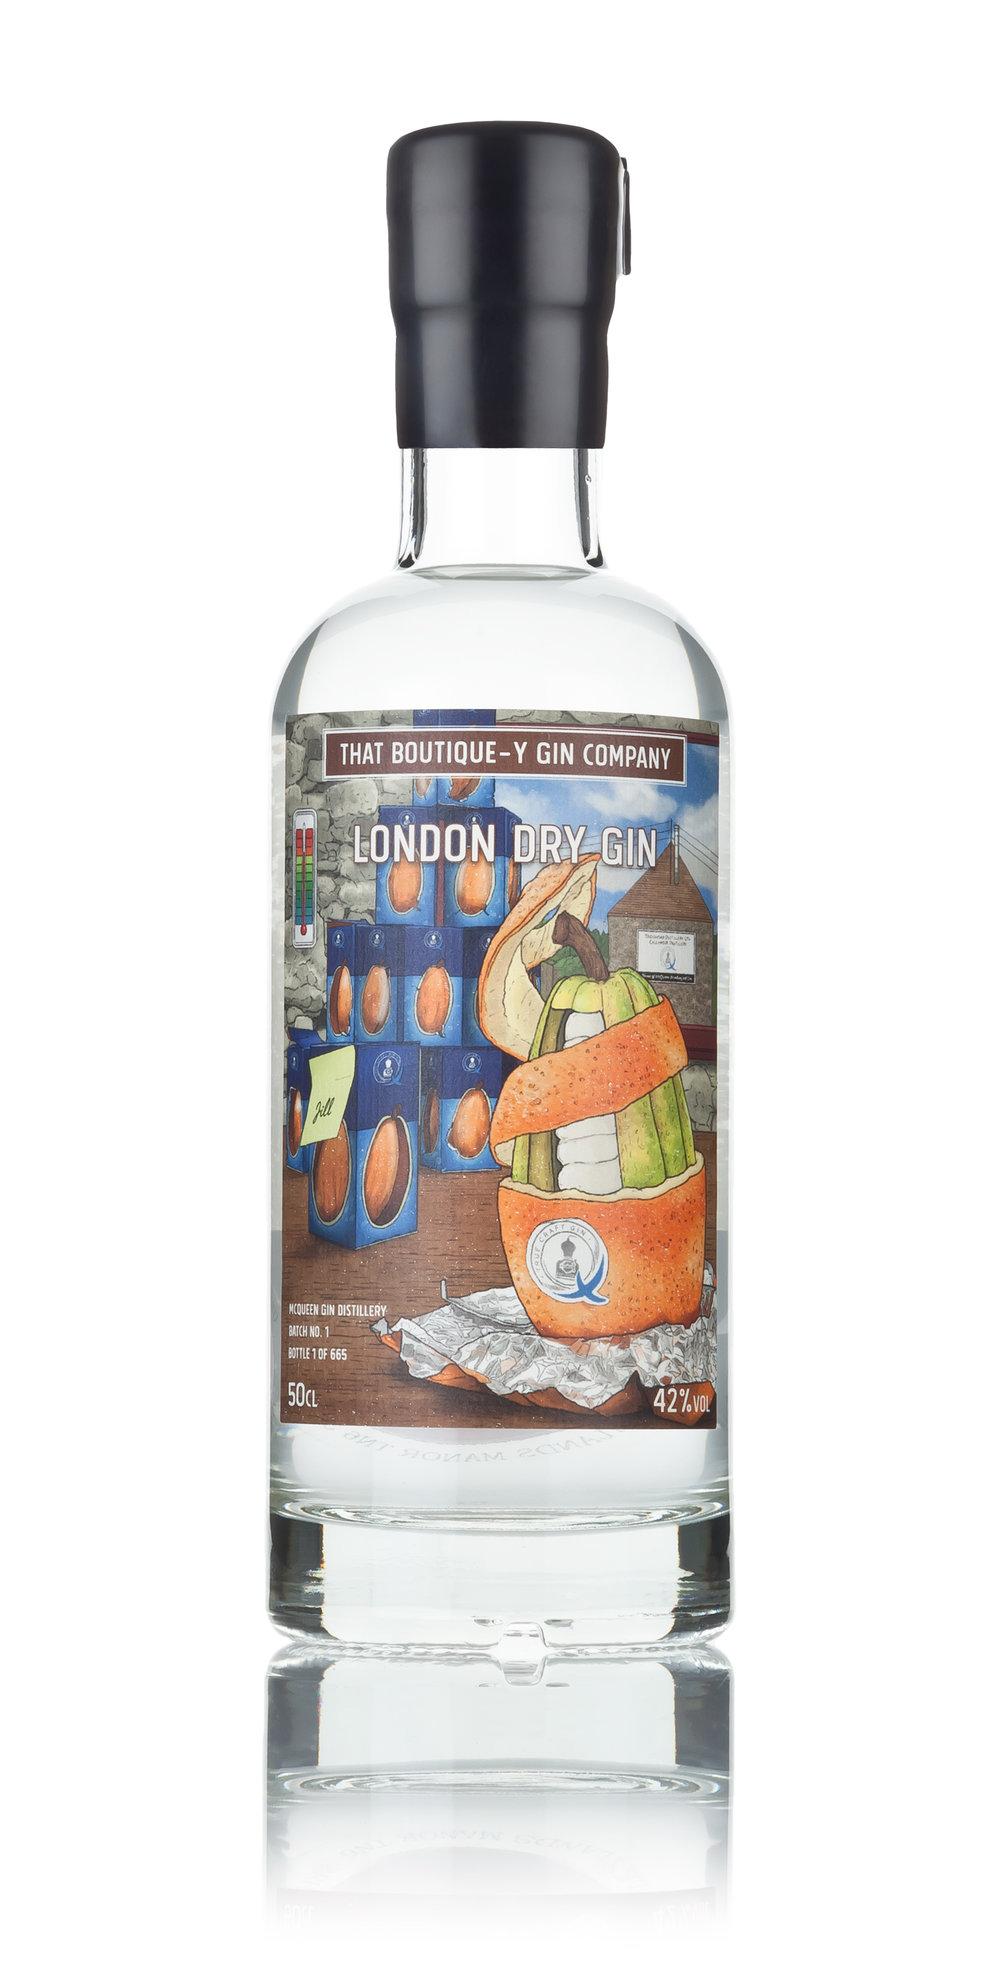 Chocolate Orange Gin - McQueen - Batch 1 (That Boutique-y Gin Company).jpg